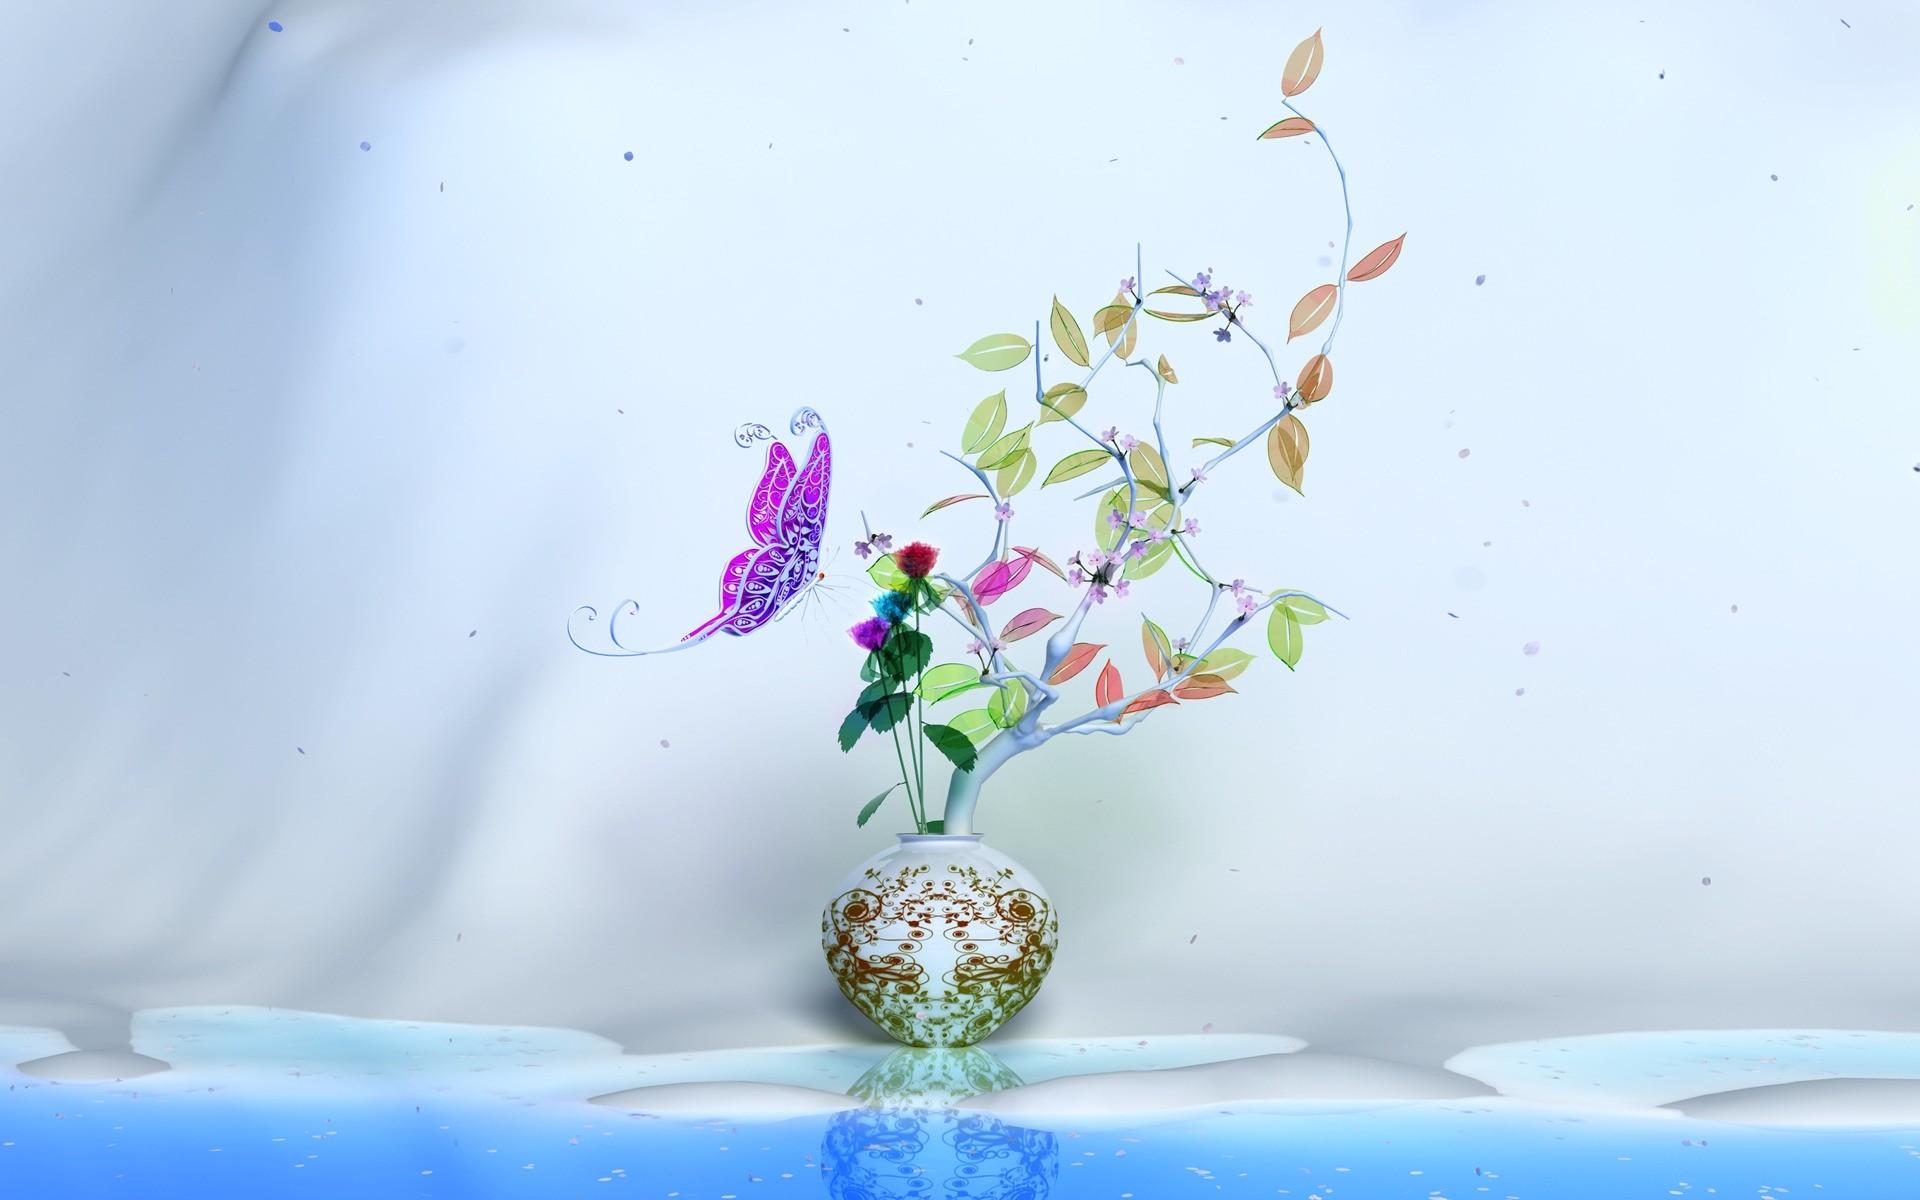 графика бабочки цветы вода graphics butterfly flowers water  № 1313524 без смс